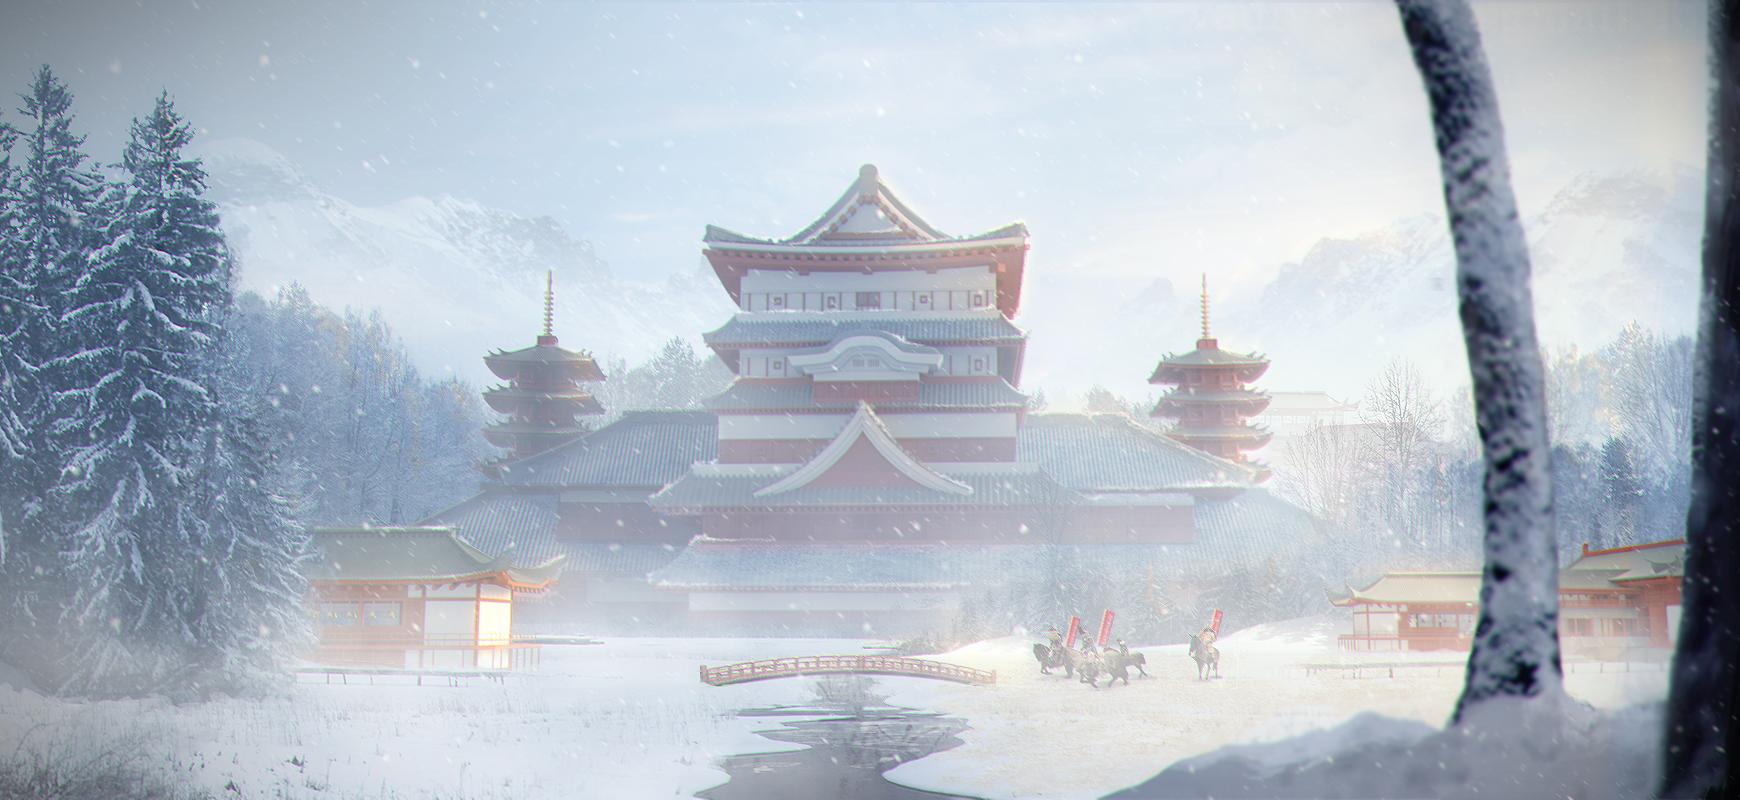 Snowfall_Matte2